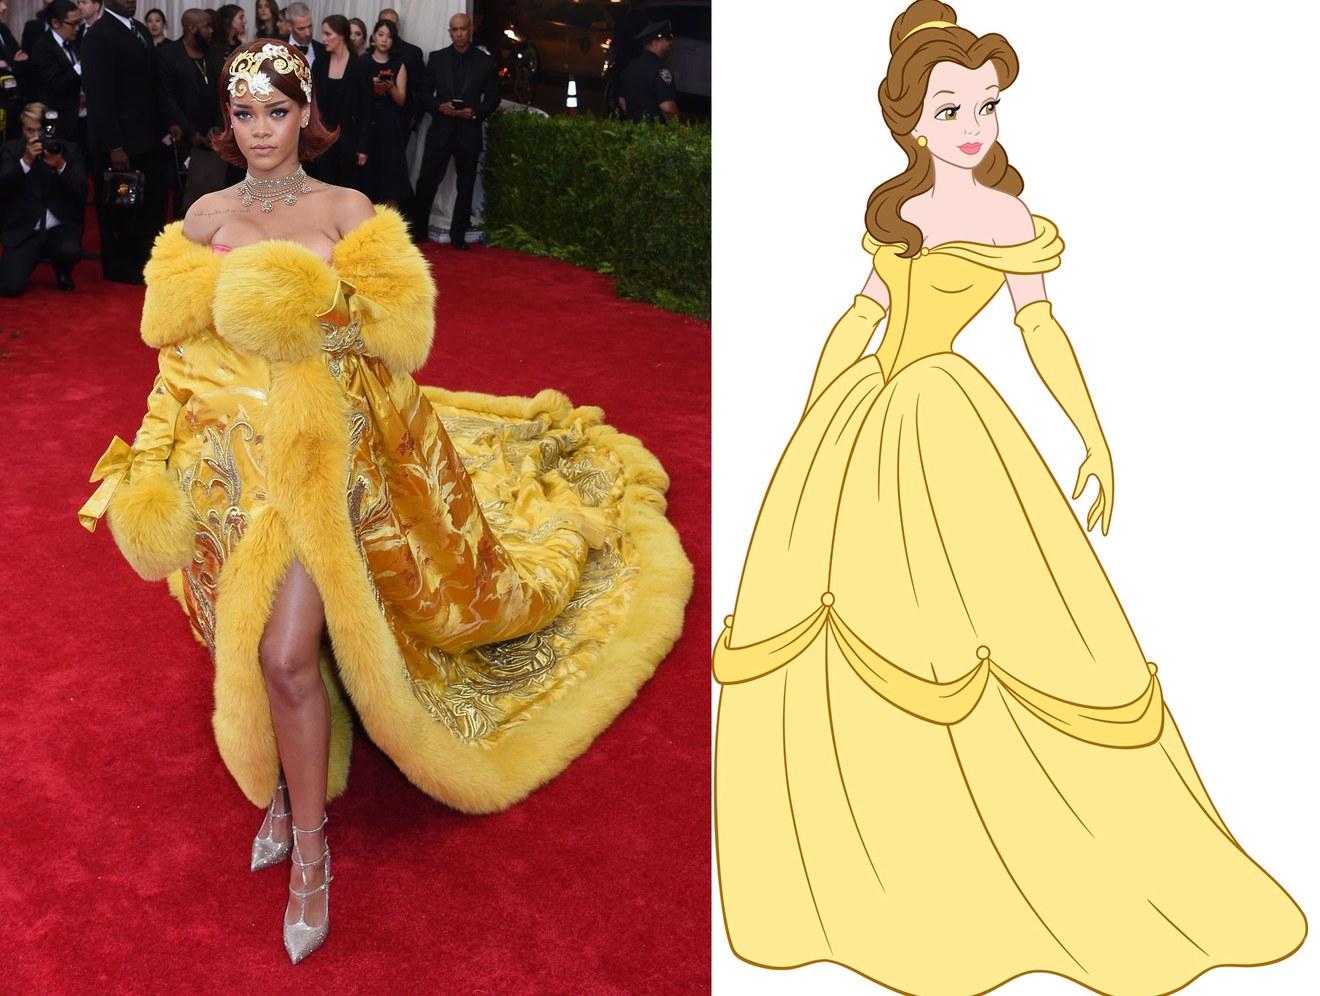 Tech Media Tainment Disney Princesses Reimagined As Abuse